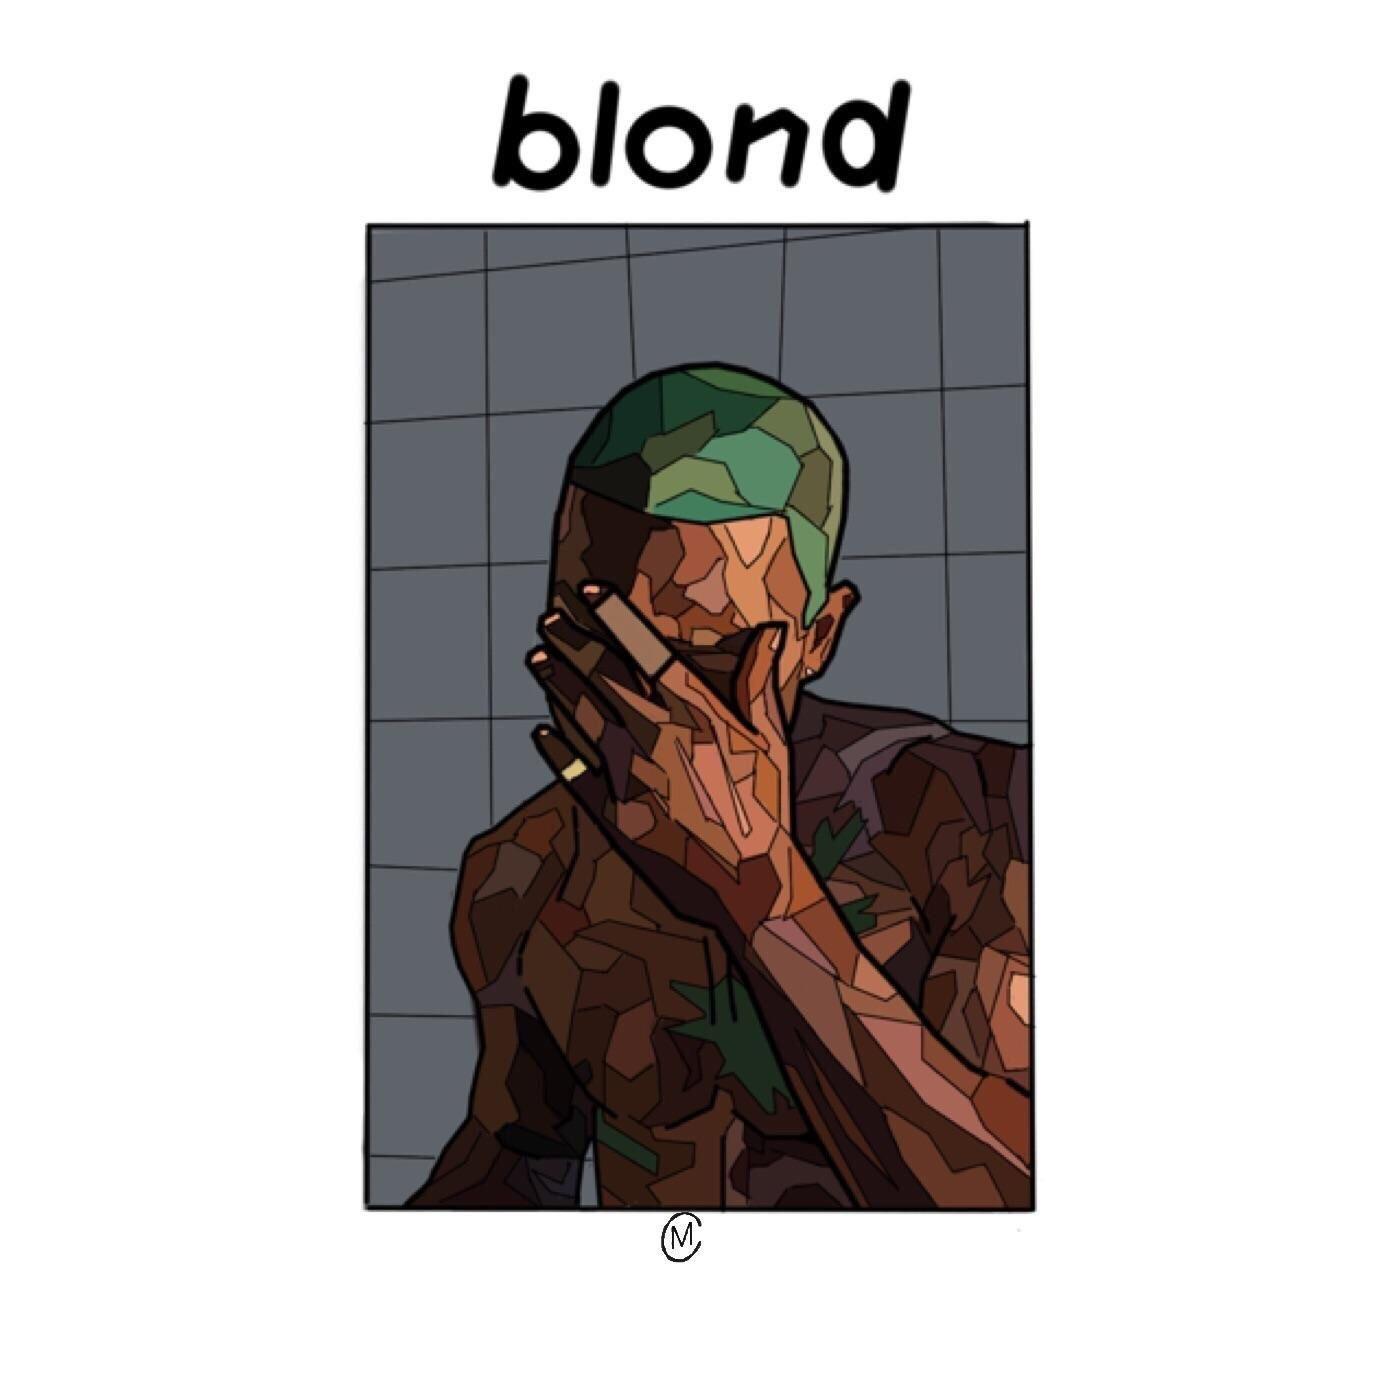 album drawing frank ocean blonde